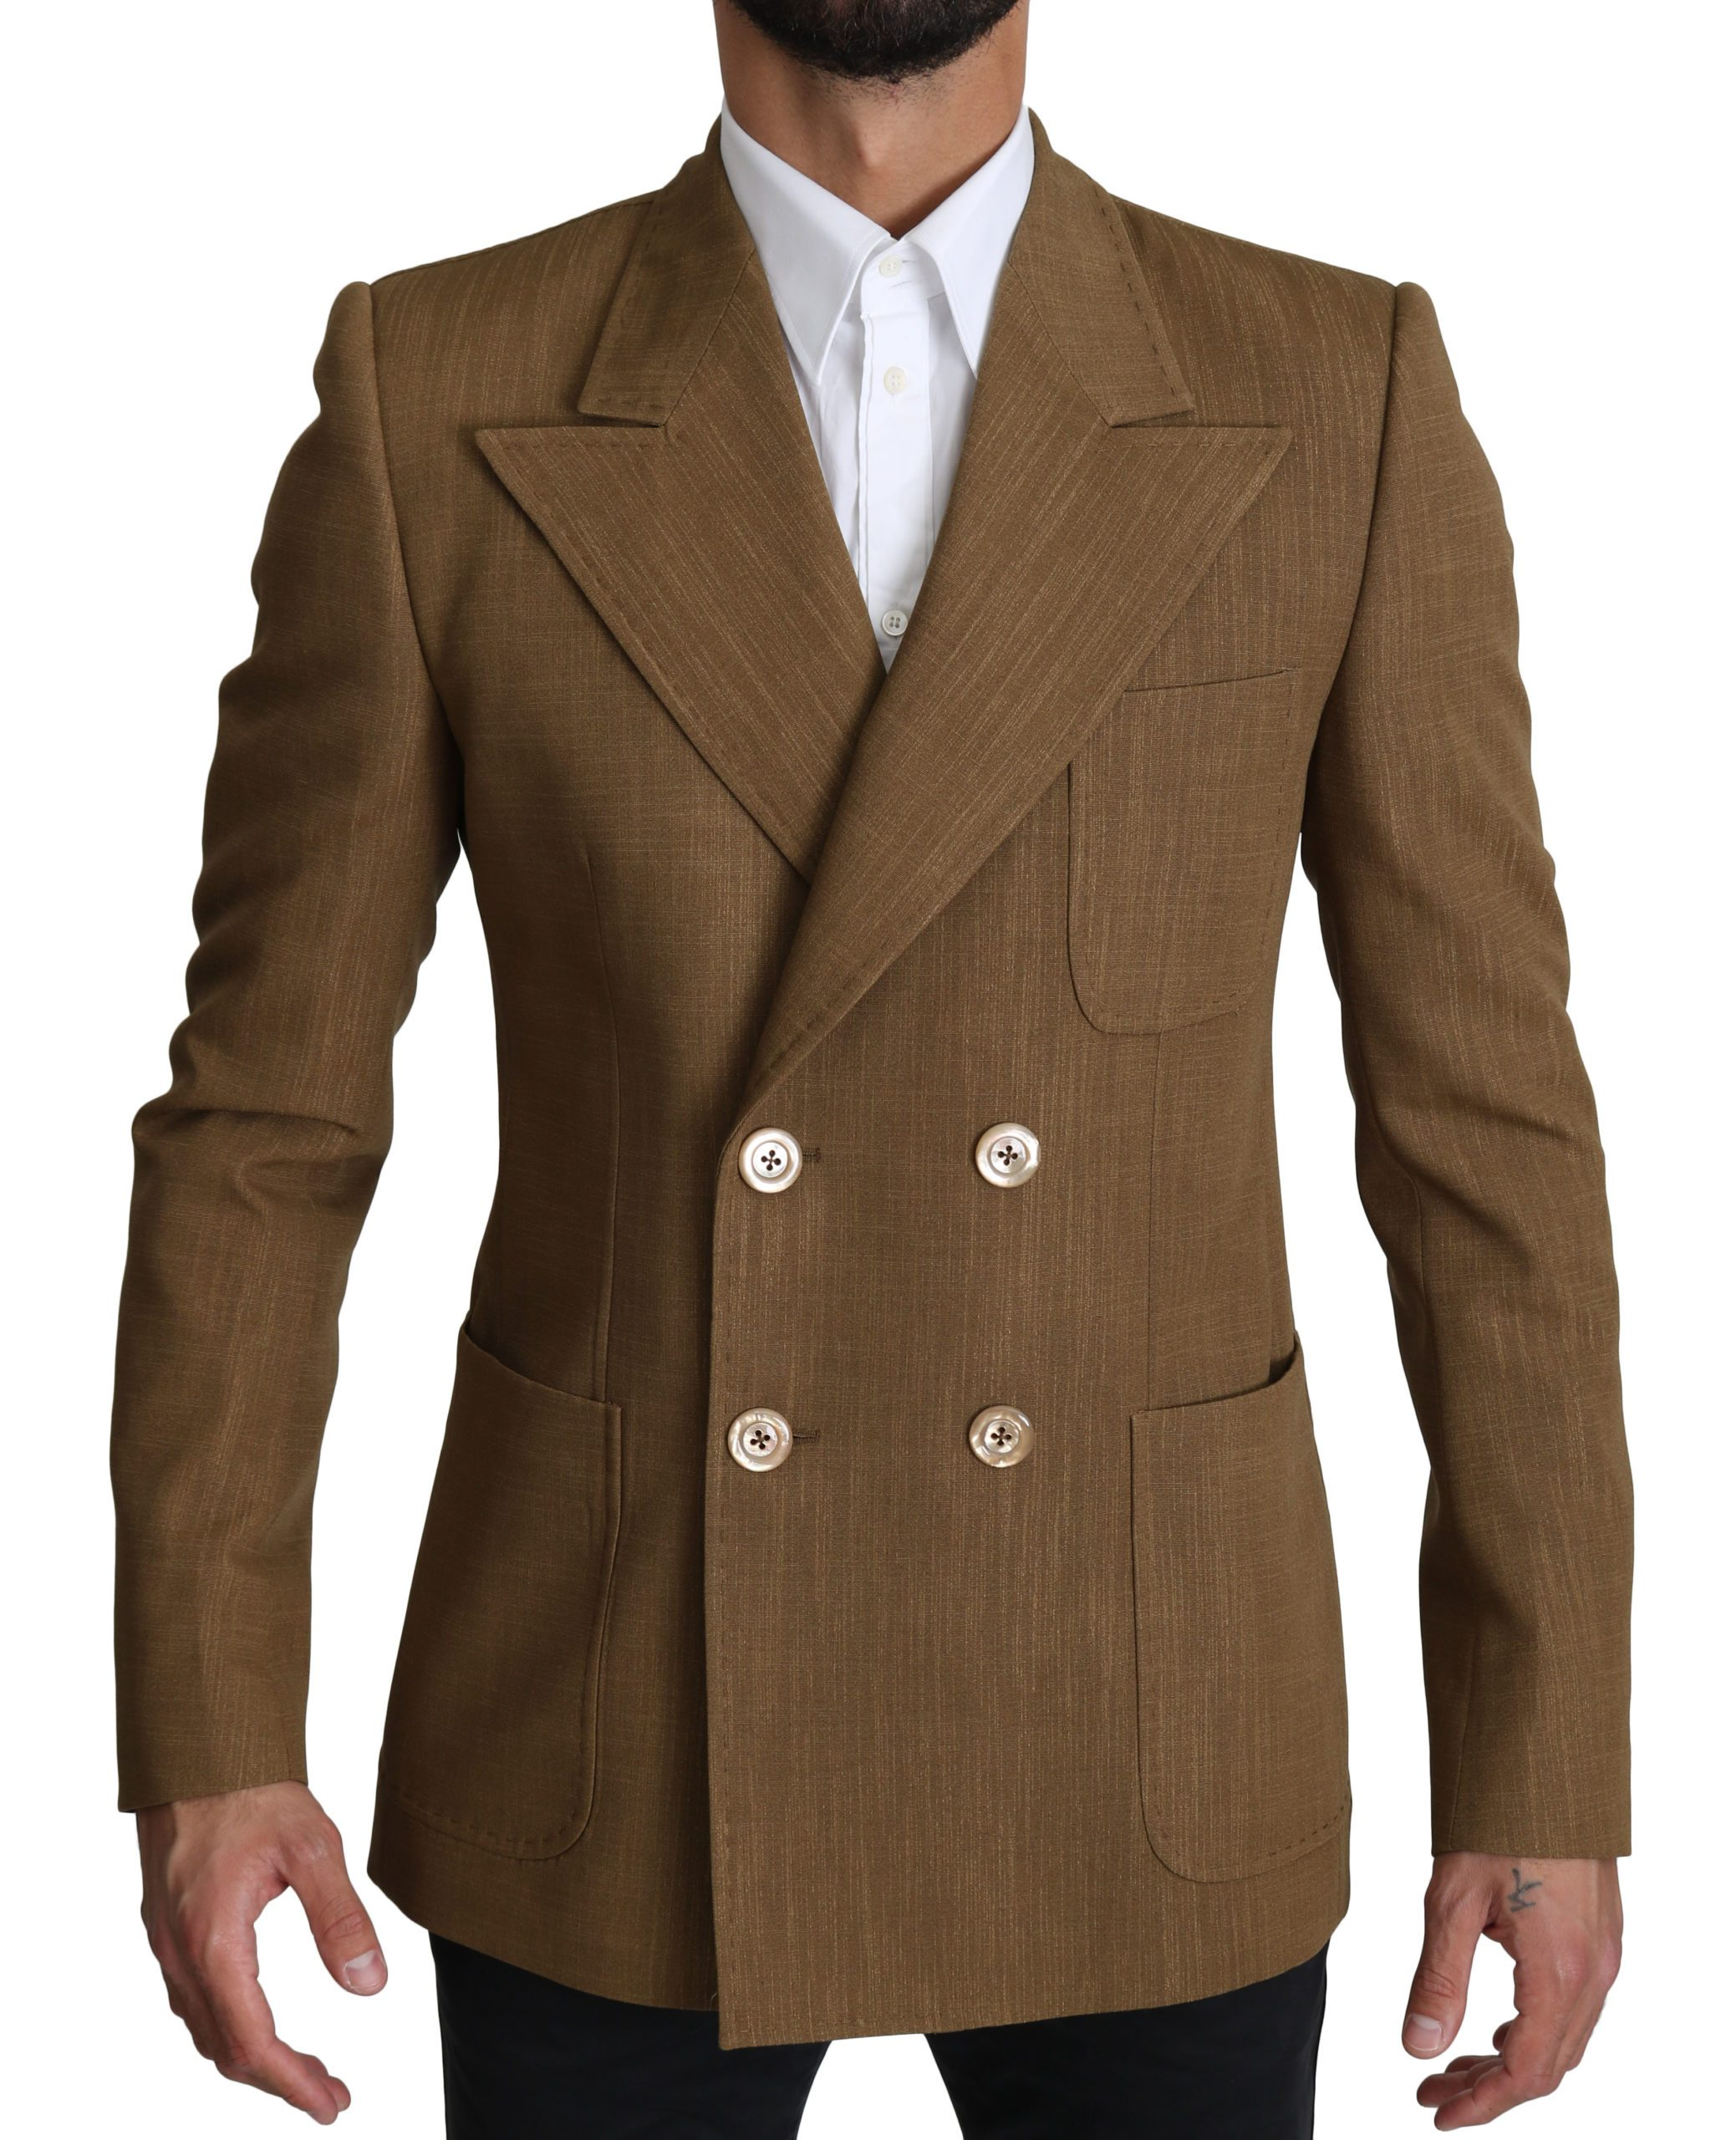 Dolce & Gabbana Men's Formal Slim fit Blazer Brown KOS1529 - IT48 | M